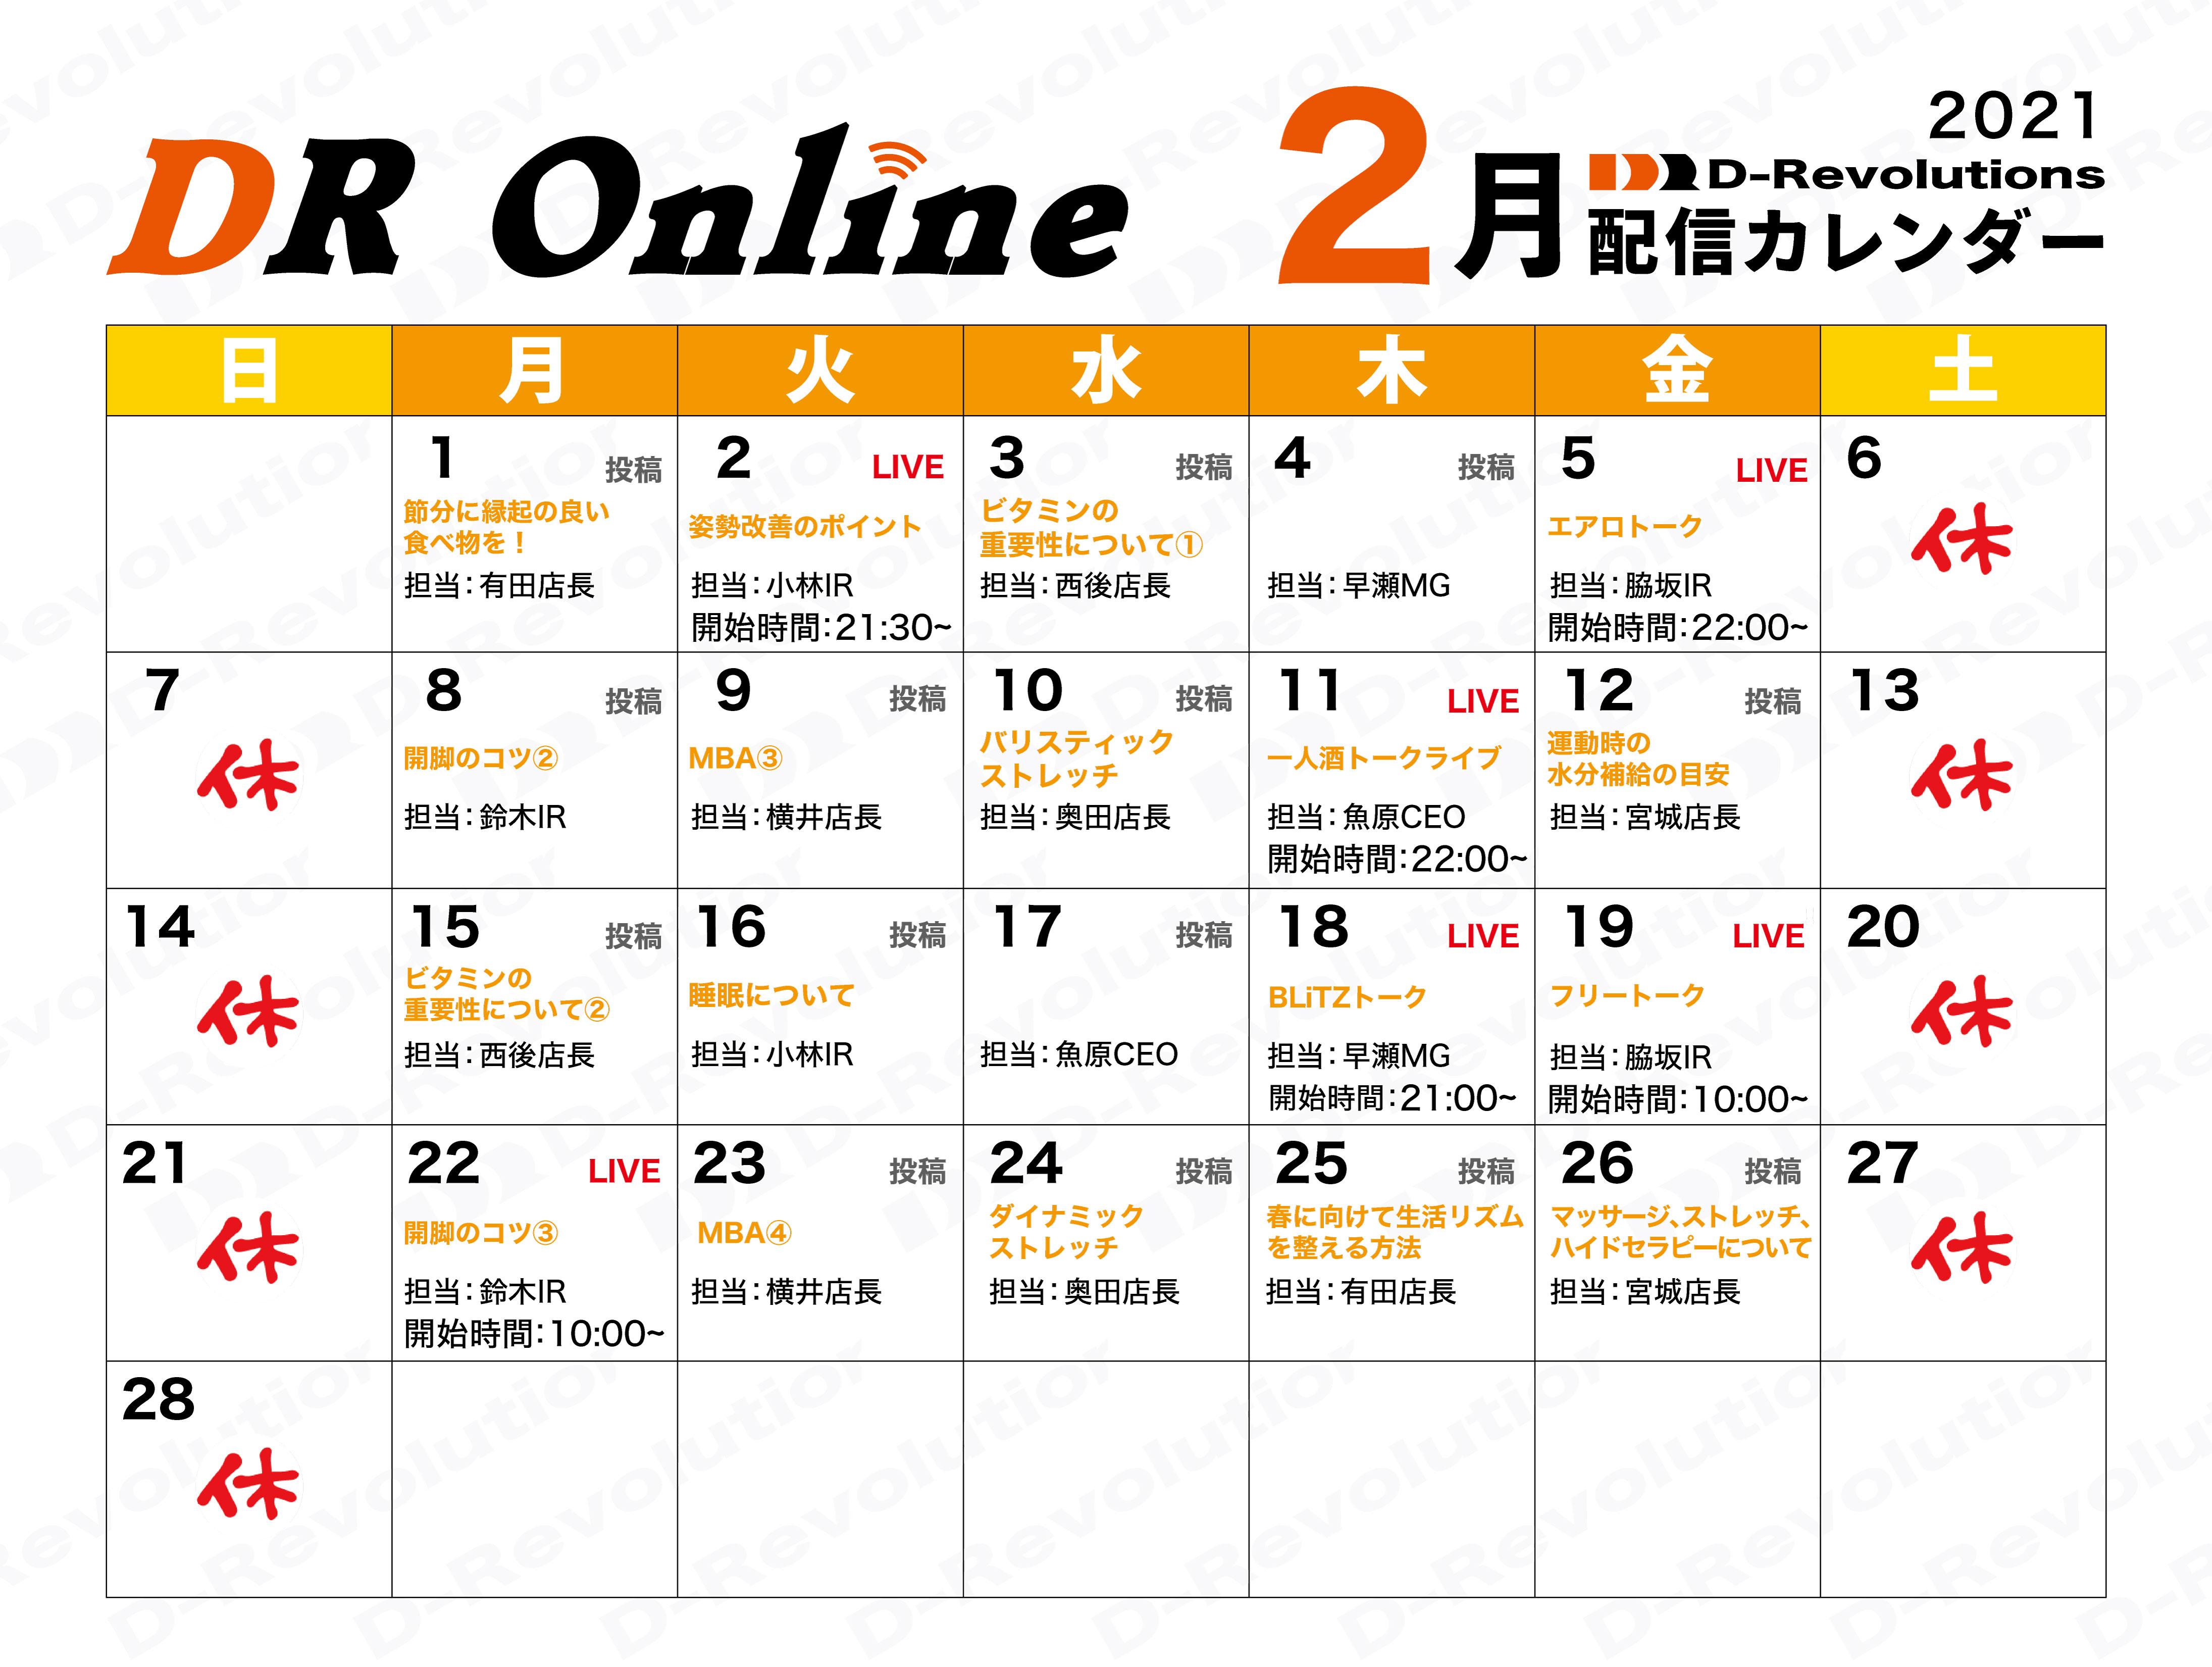 DR Online 2021/02月配信カレンダー